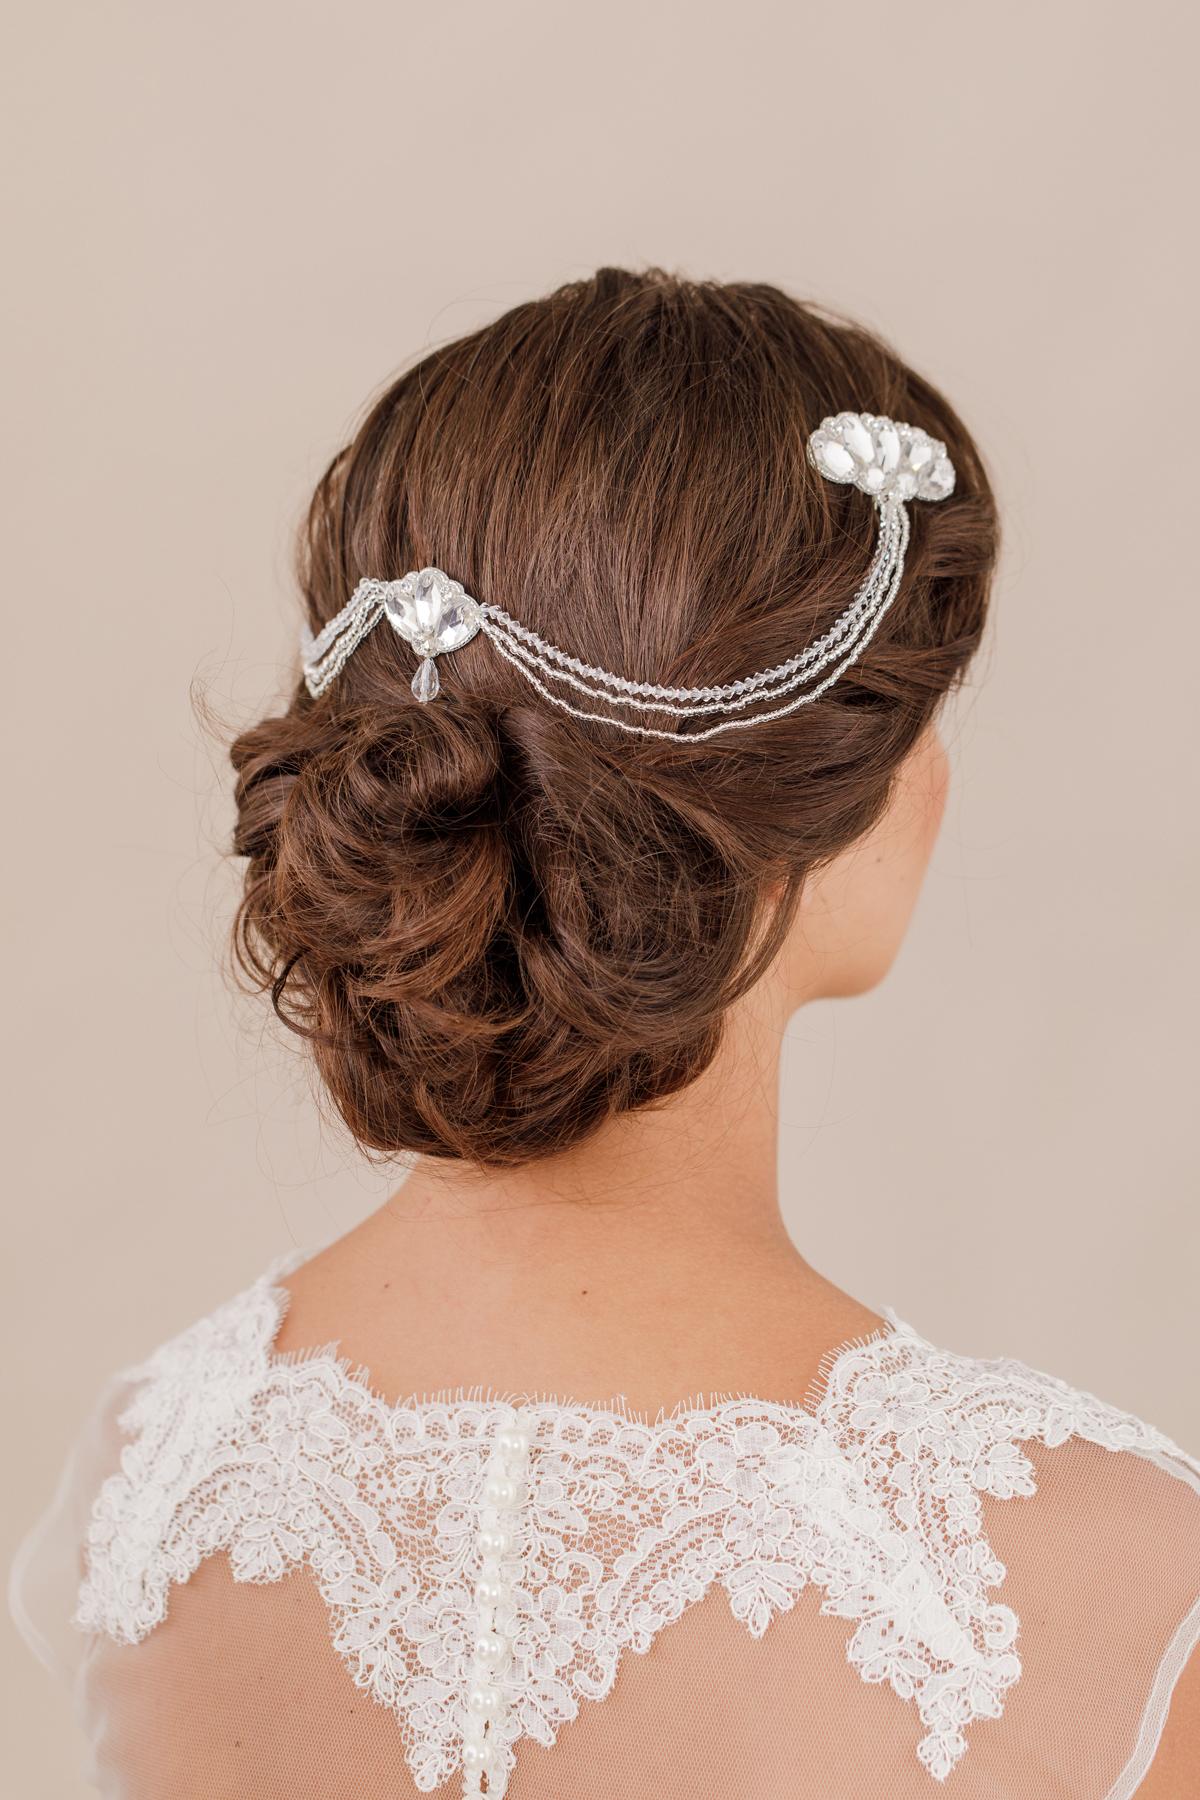 Best Of British Luxury Handcrafted Bridal Accessories